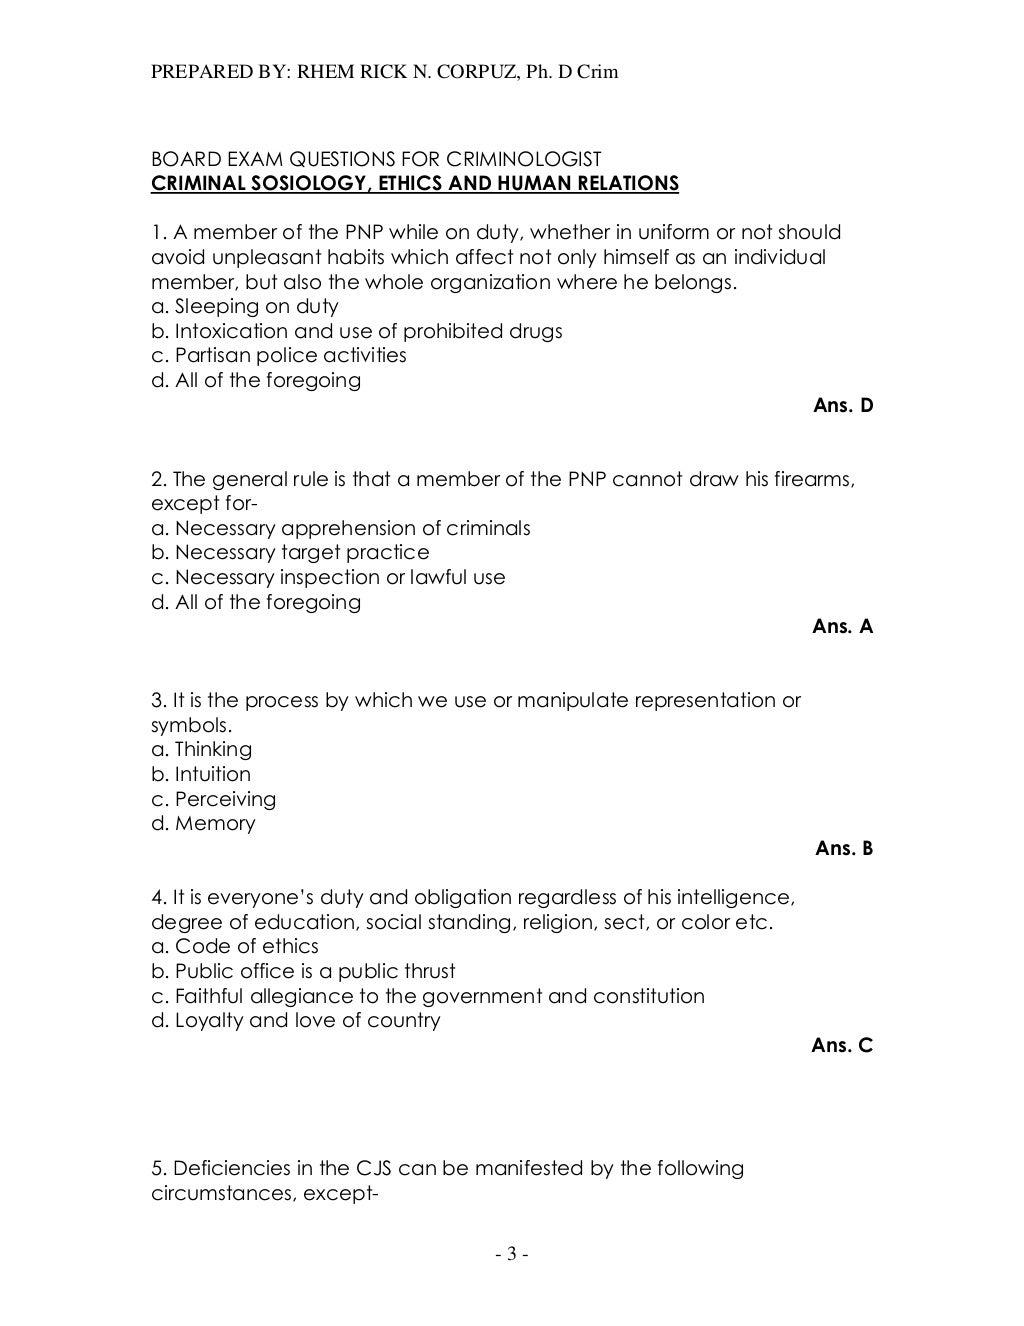 dissertation questions for criminology